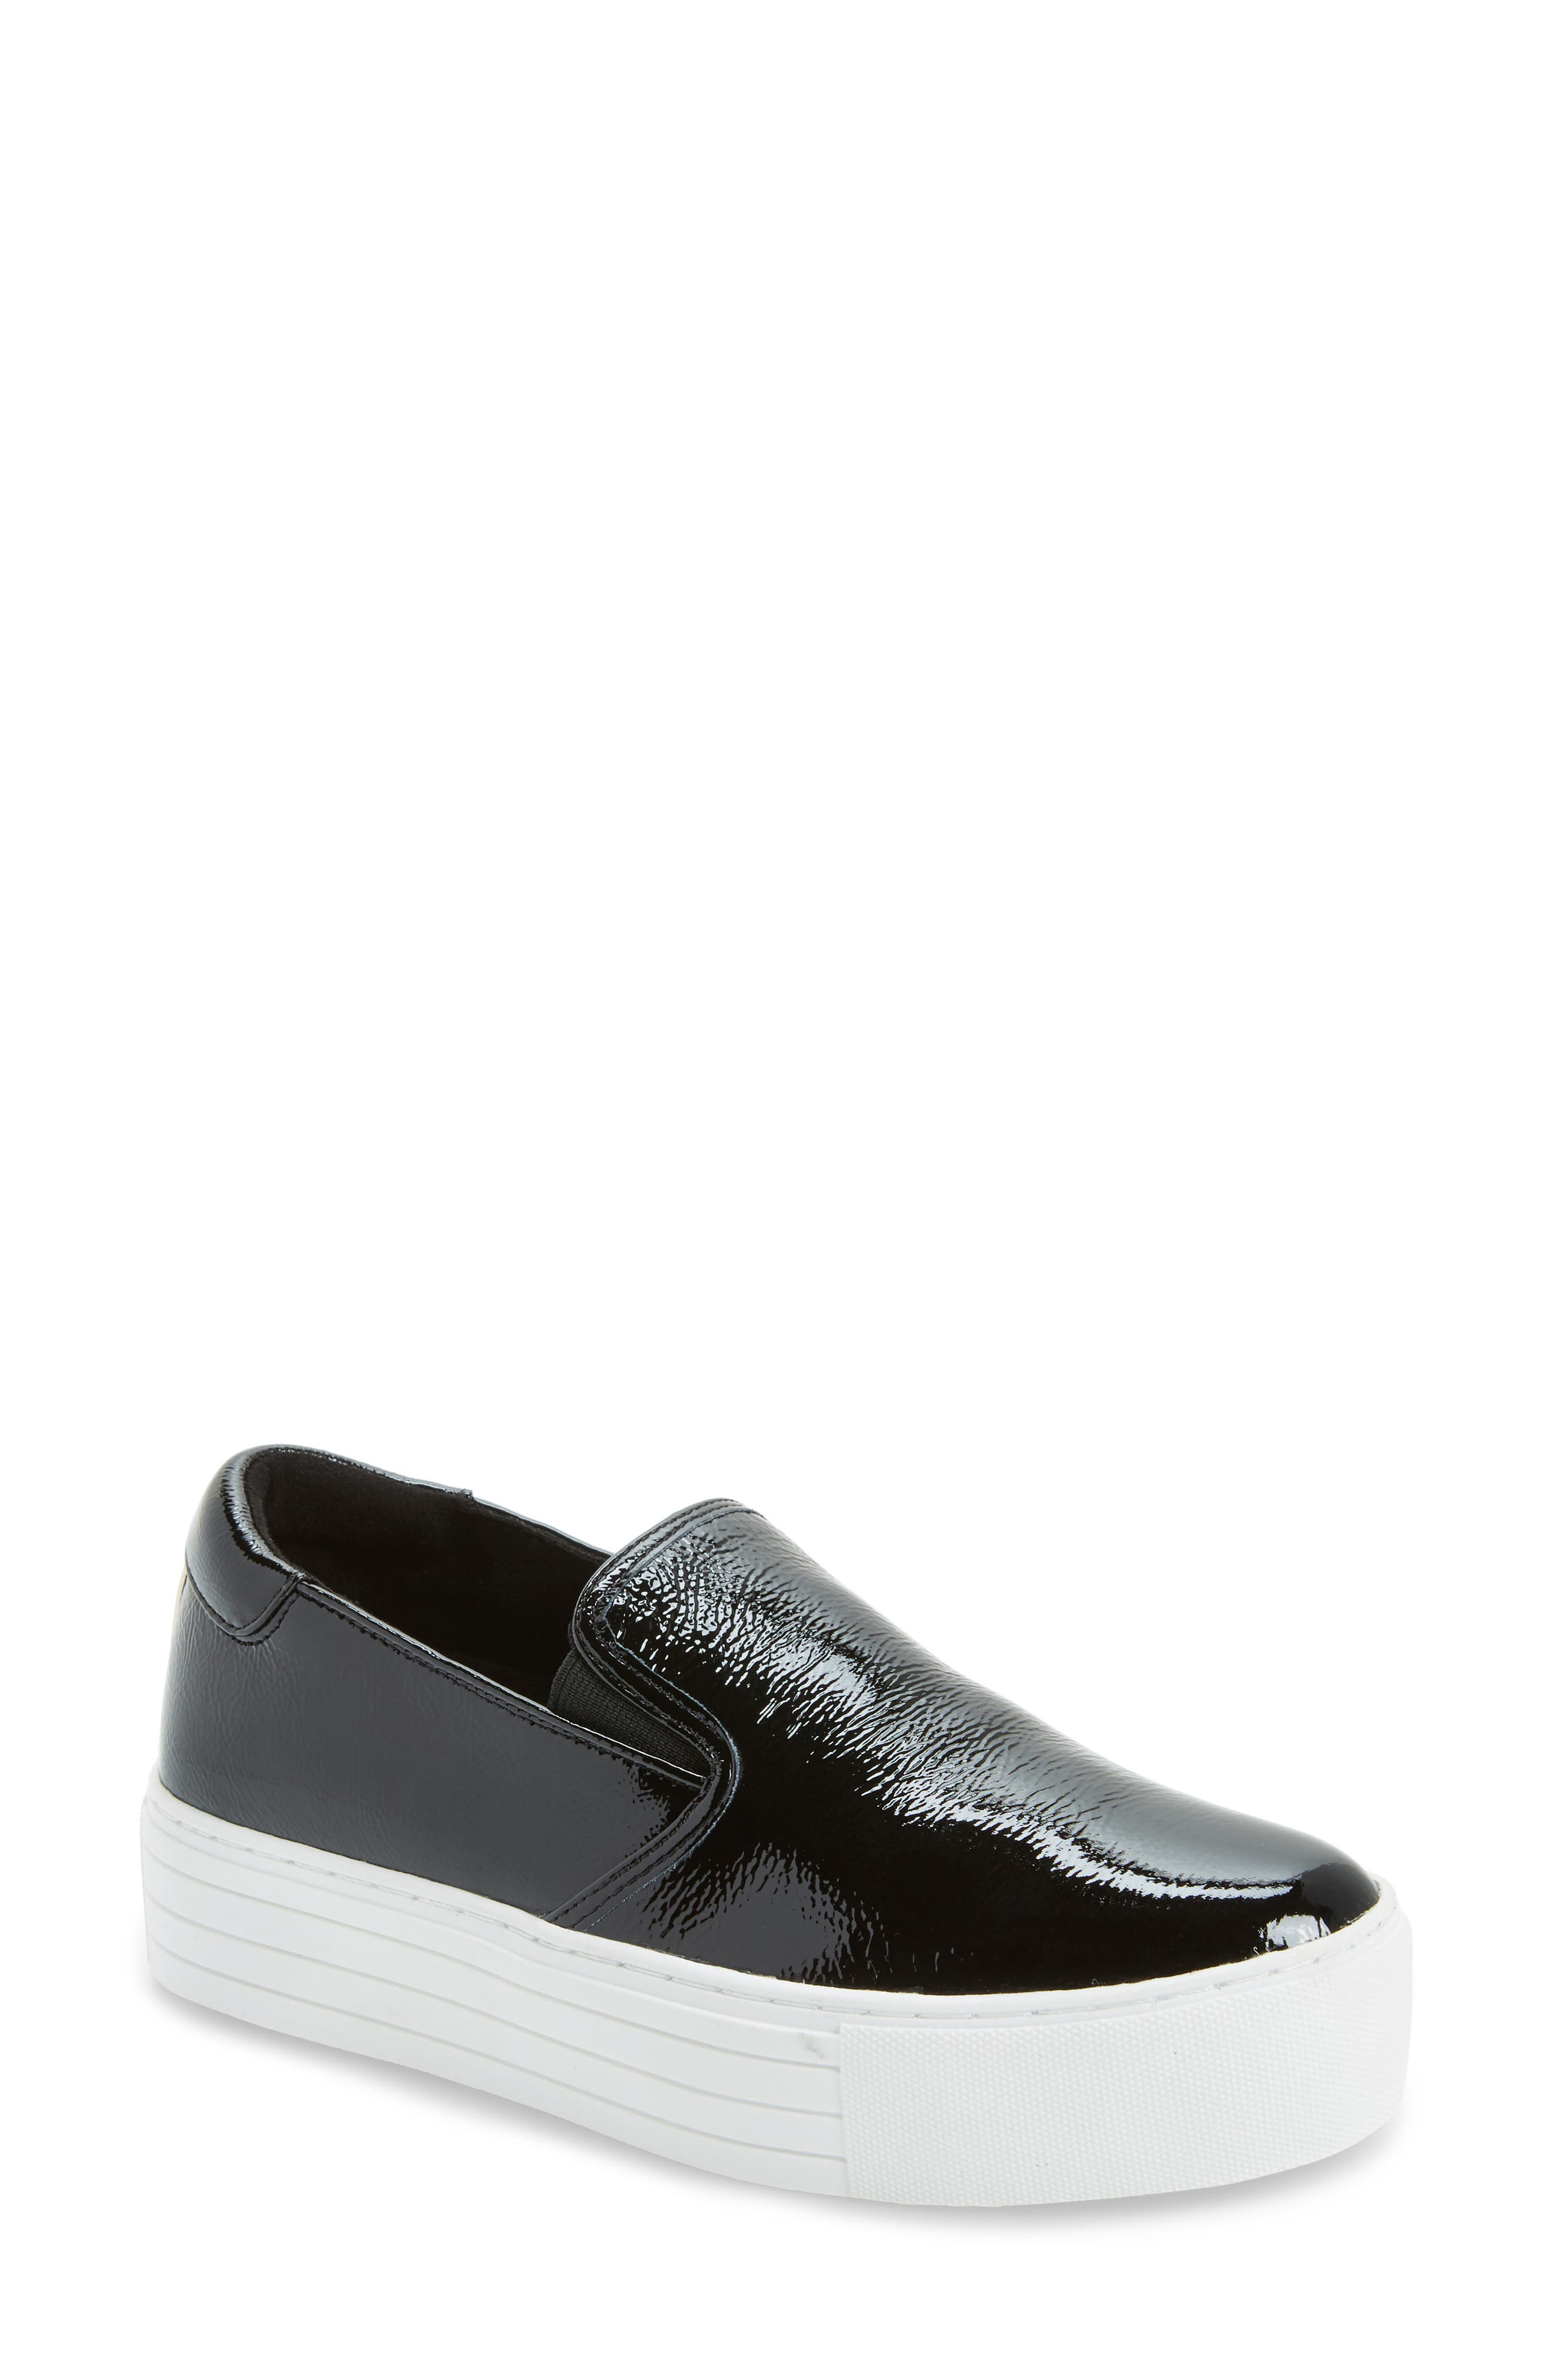 Joanie Slip-On Platform Sneaker,                             Main thumbnail 8, color,